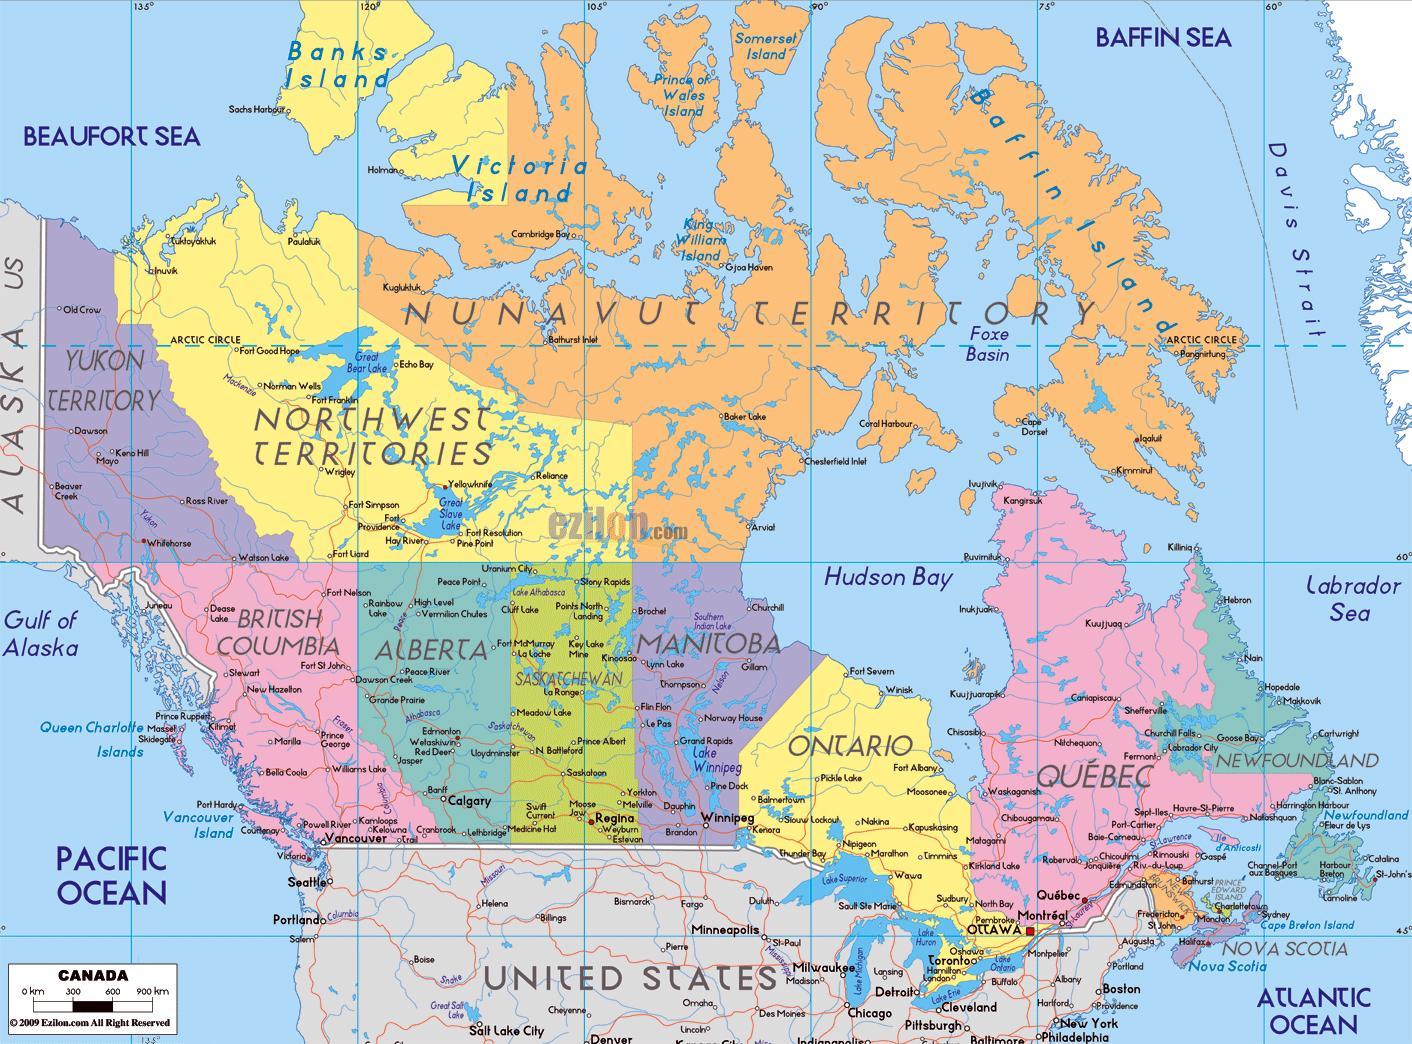 Amerika Gradovi Karta.Kanada Kartica S Imenima Gradova Detaljna Karta Kanade Sa